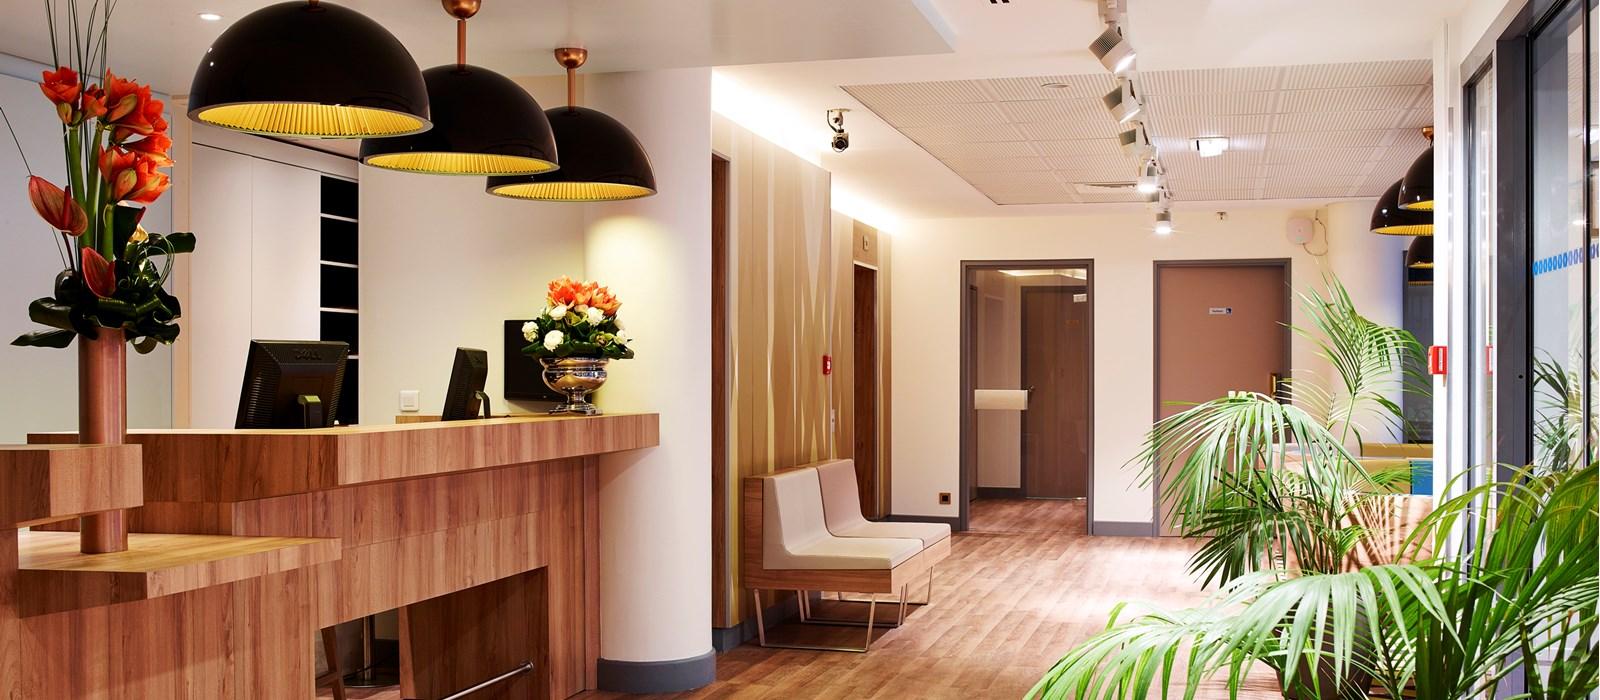 Median paris porte de versailles 3 star hotel paris - Hotel porte de versailles parc des expositions ...